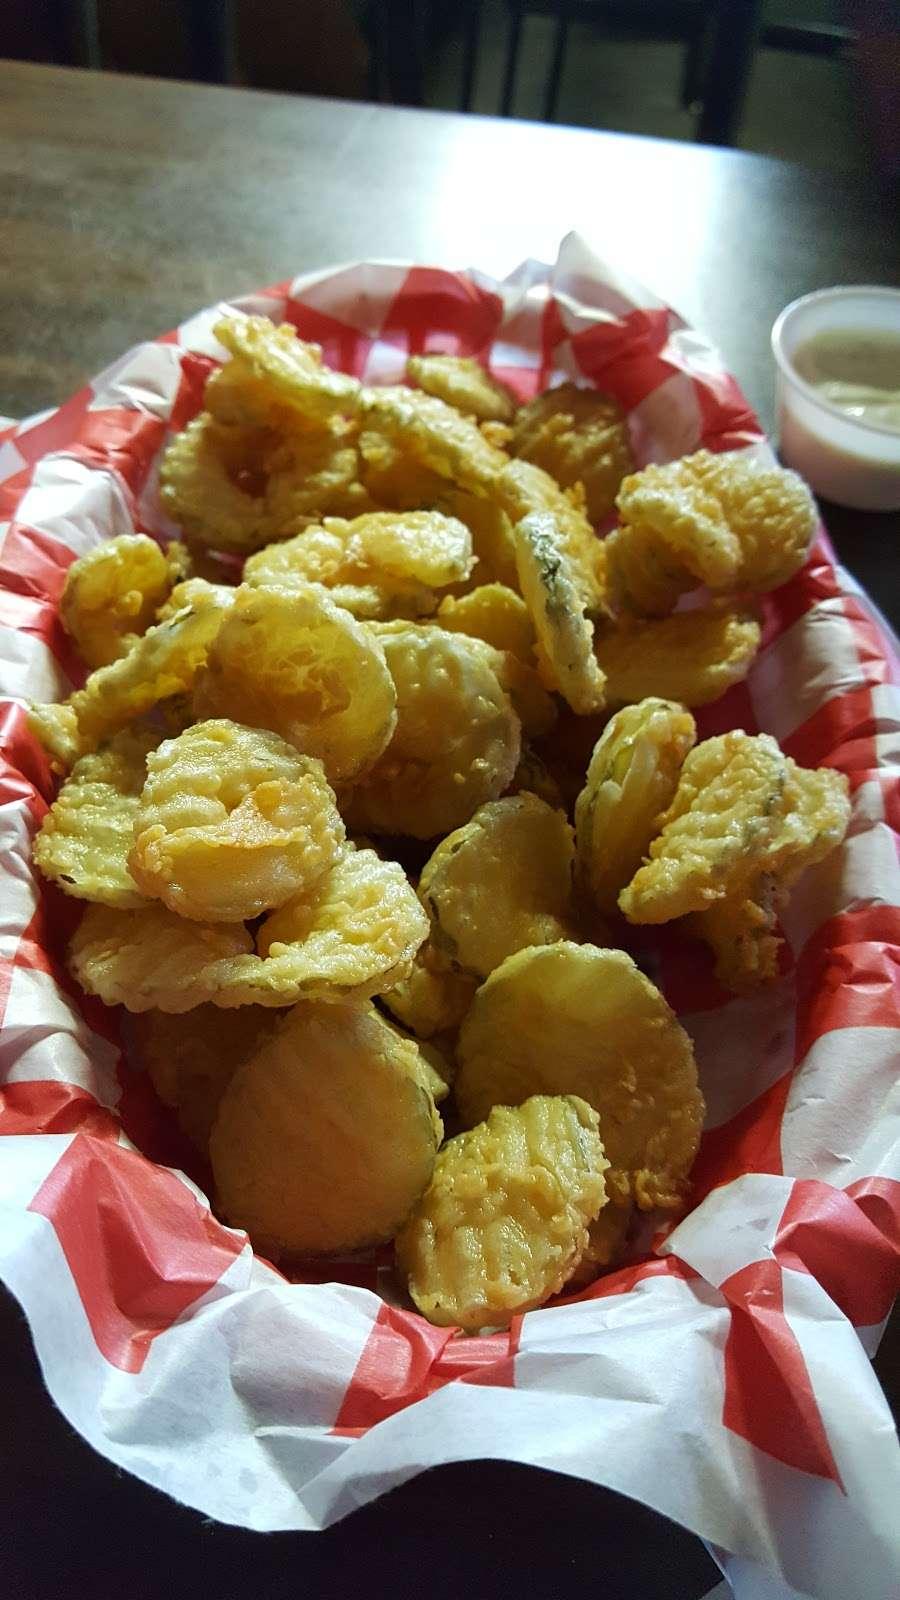 Repkas Grocery - restaurant  | Photo 4 of 10 | Address: 8481 Buller Rd, Brookshire, TX 77423, USA | Phone: (281) 934-4499